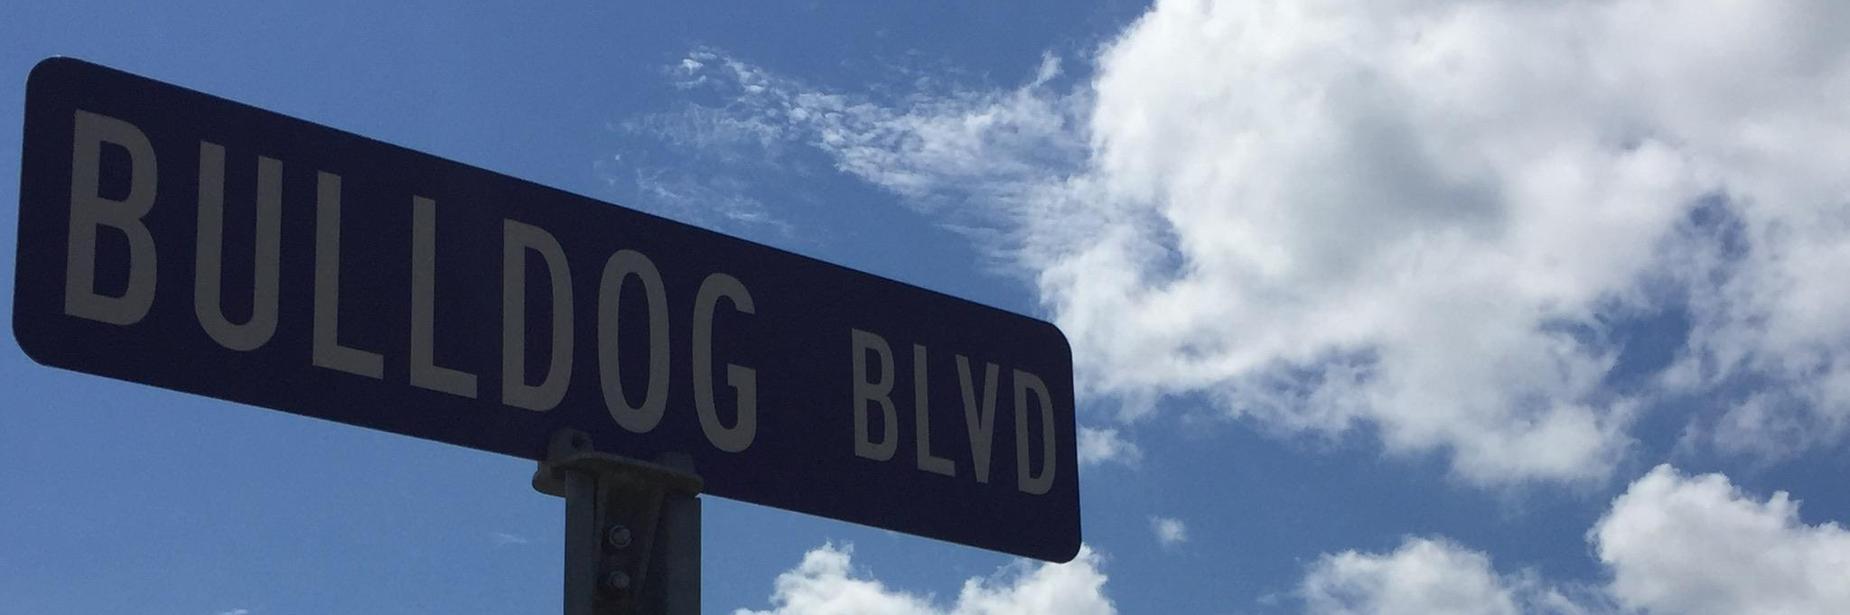 bulldog blvd road sign